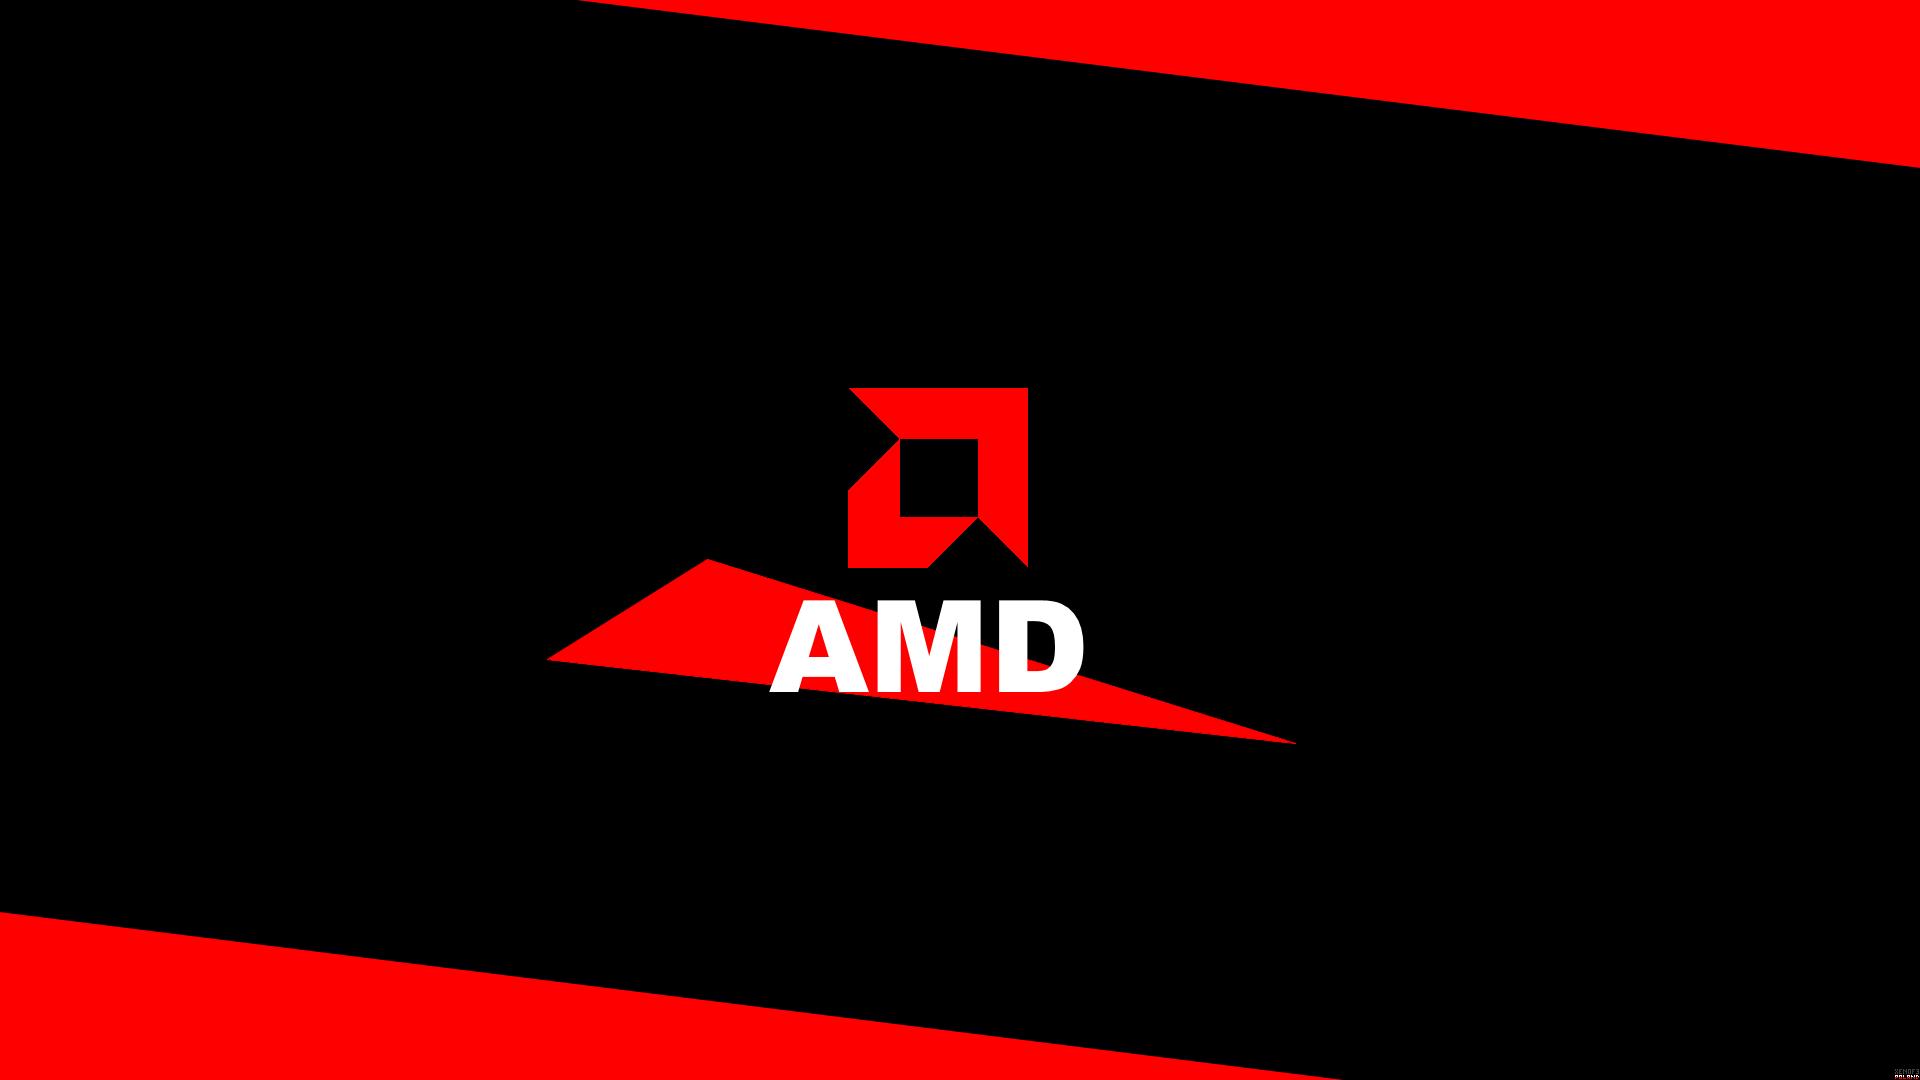 AMD Desktop and Display Management